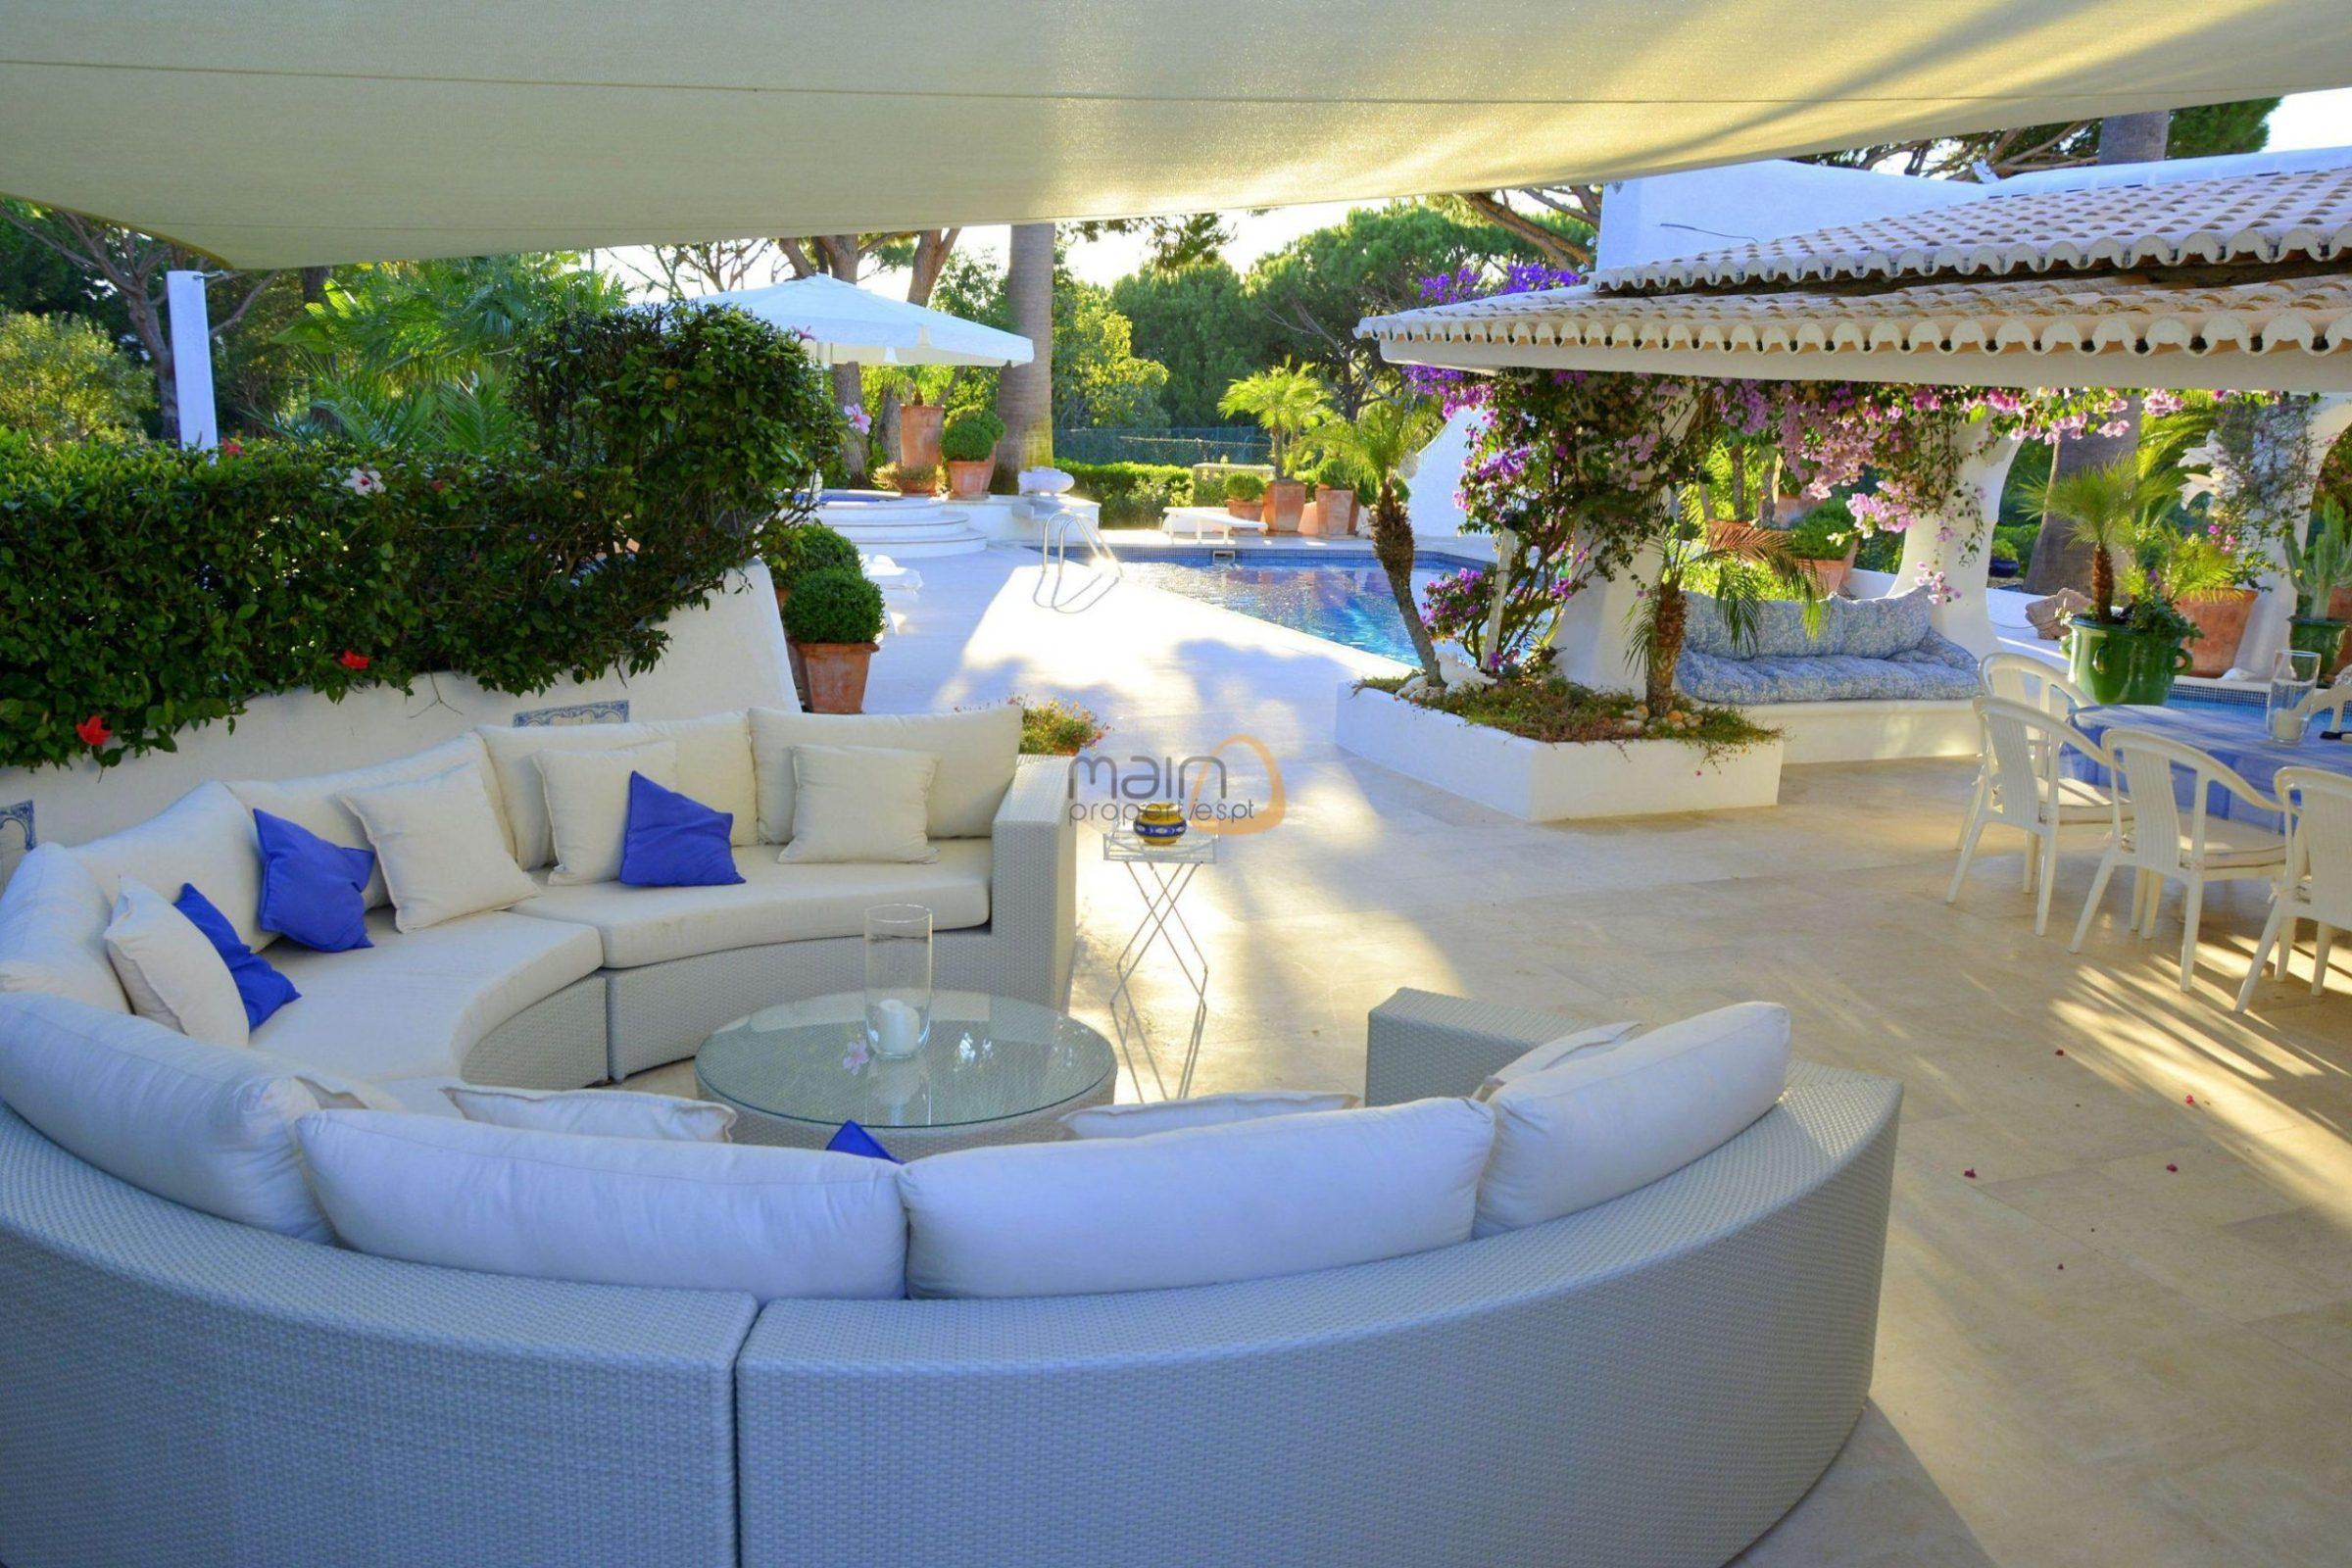 [:pt]Moradia com 5 quartos na Quinta do Lago :: Piscina 3 :: MainProperties :: 020061[:en]5 bedroom villa  in Quinta do Lago :: Pool 2 :: MainProperties :: 020061[:]